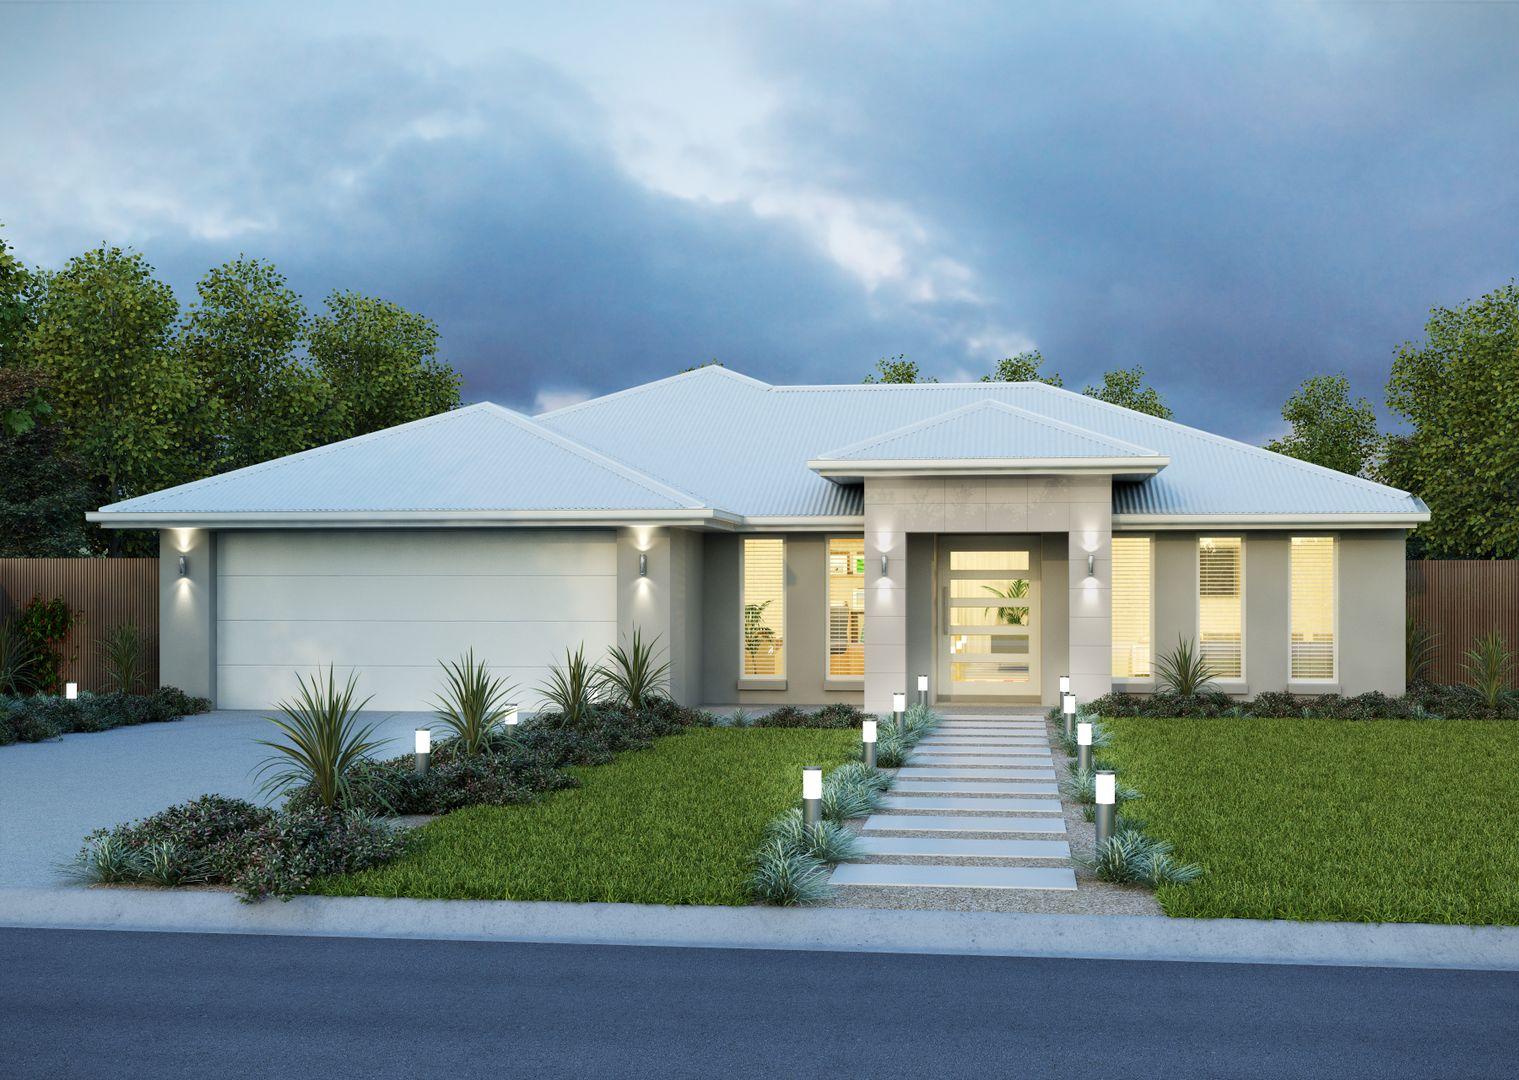 Lot 2 Marty Street, High Park Estate, Wynnum West QLD 4178, Image 0